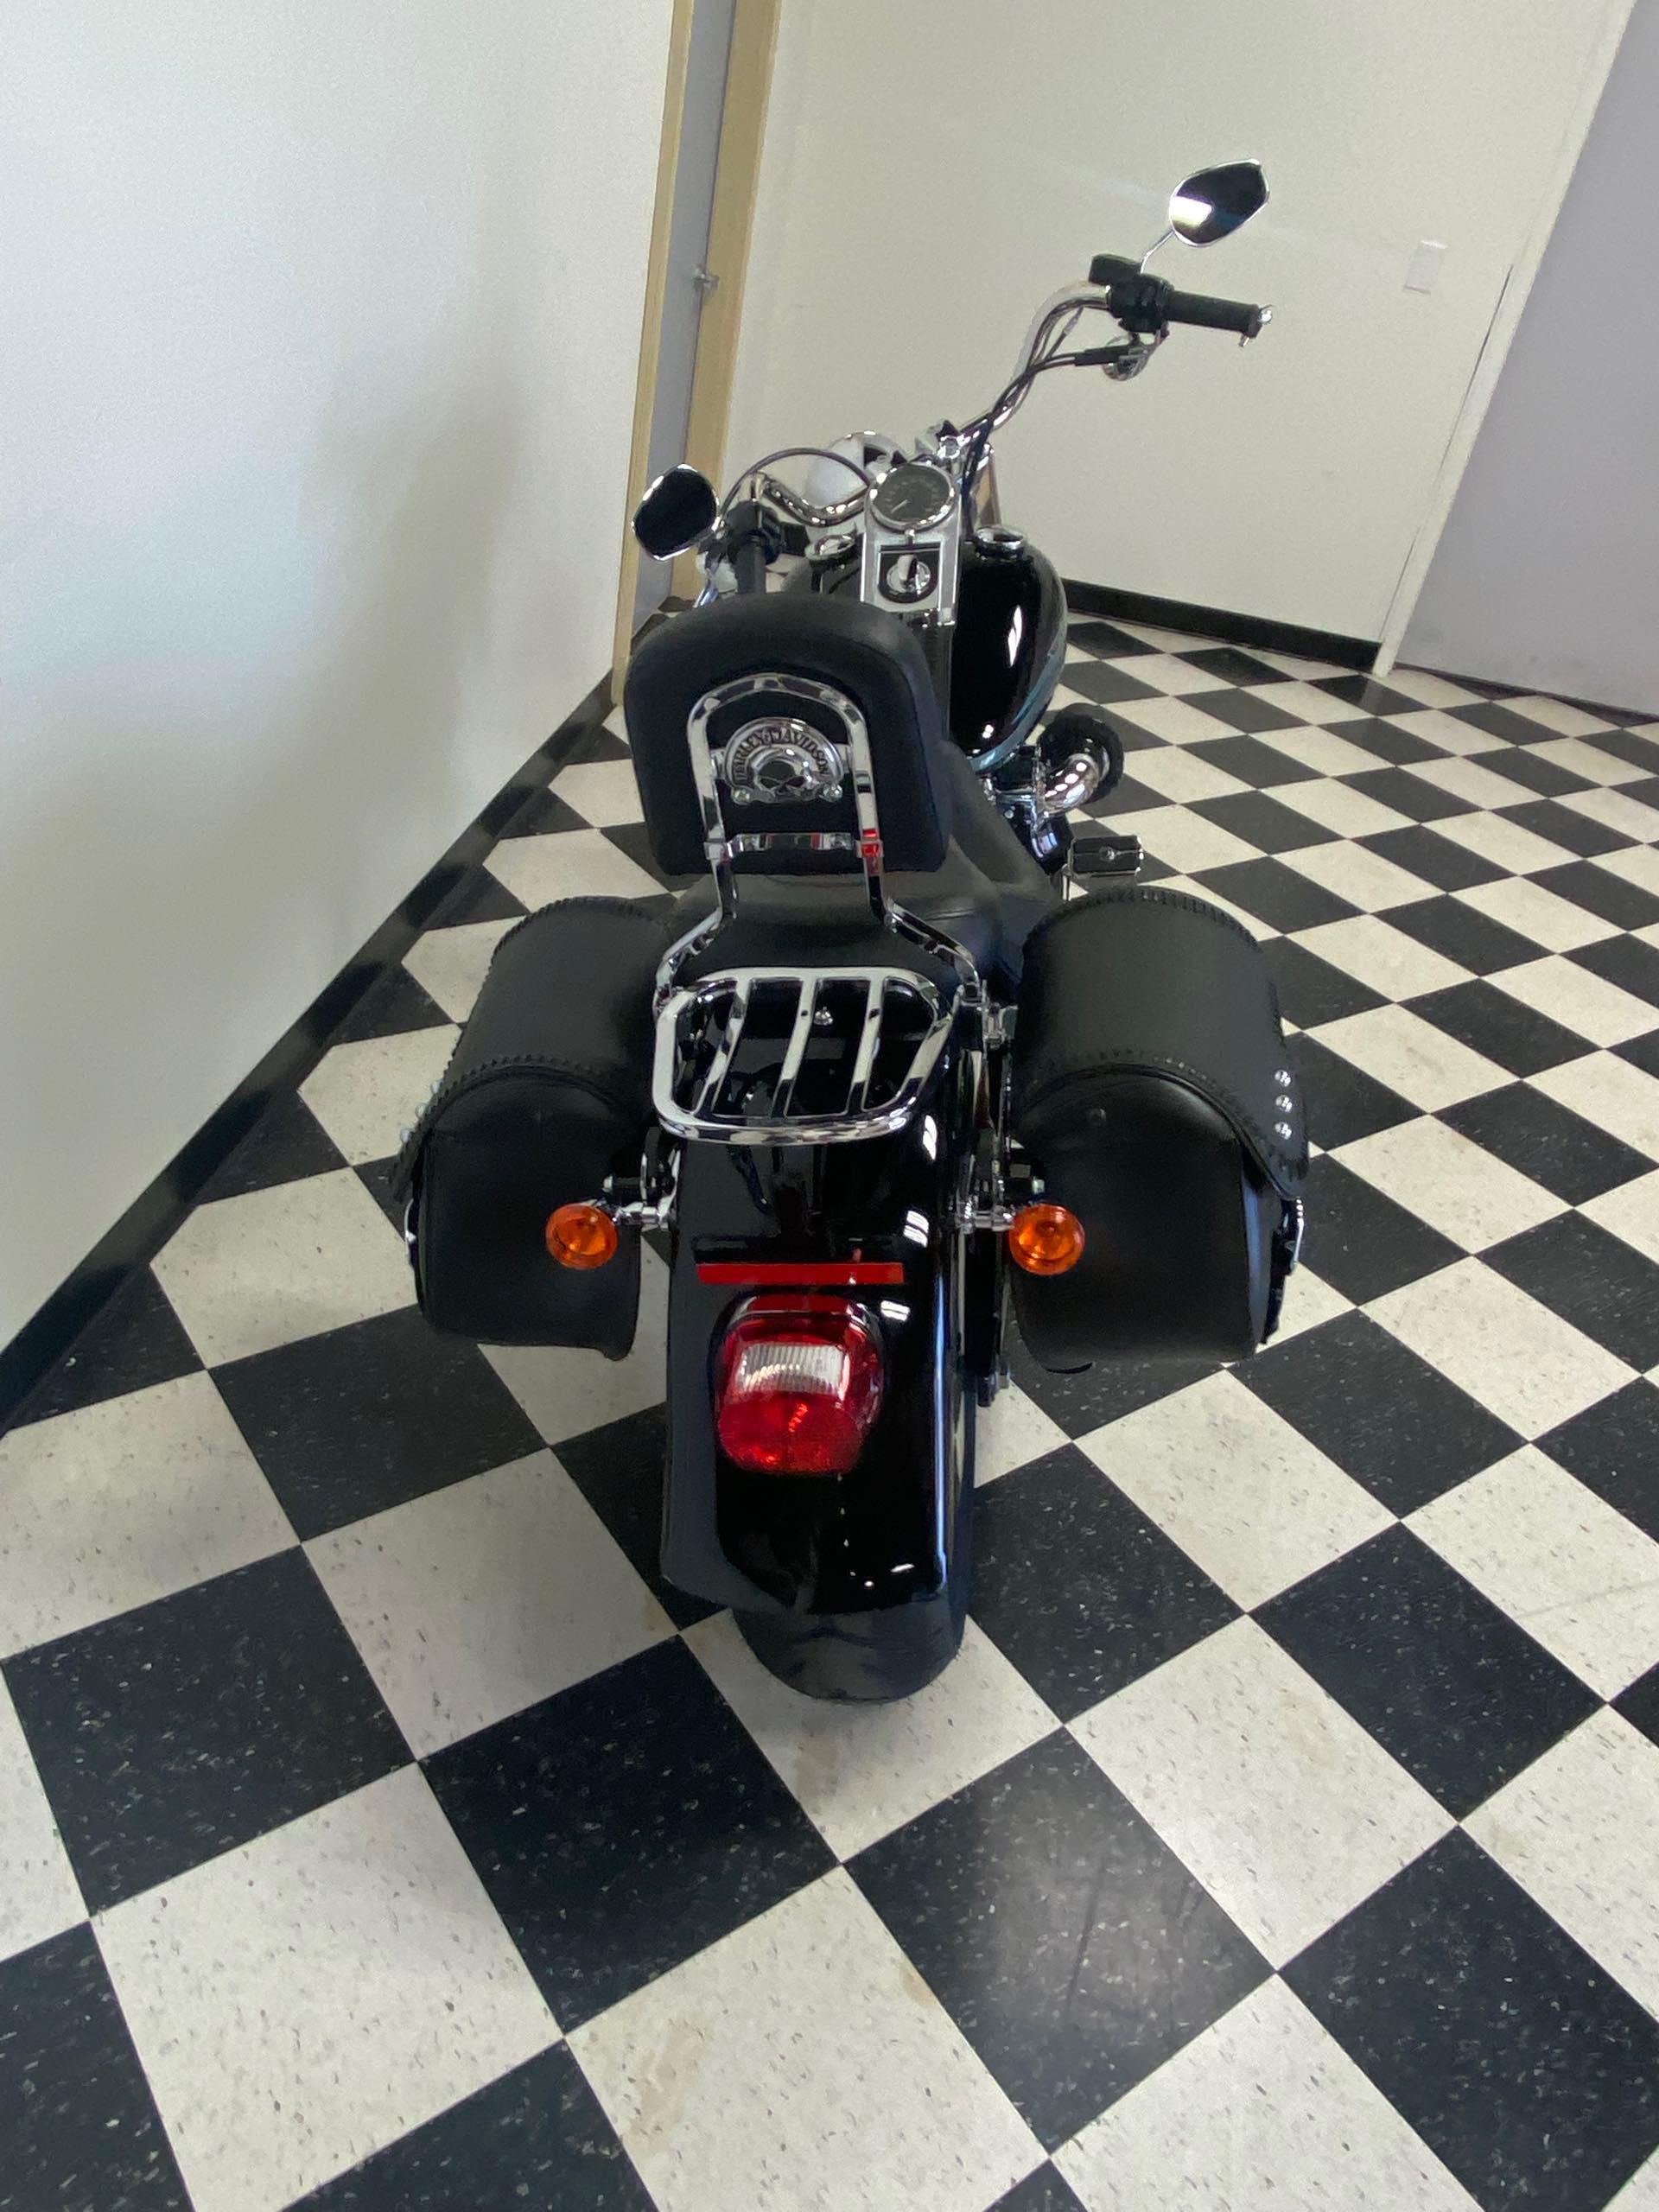 2009 Harley-Davidson Softail Fat Boy at Deluxe Harley Davidson